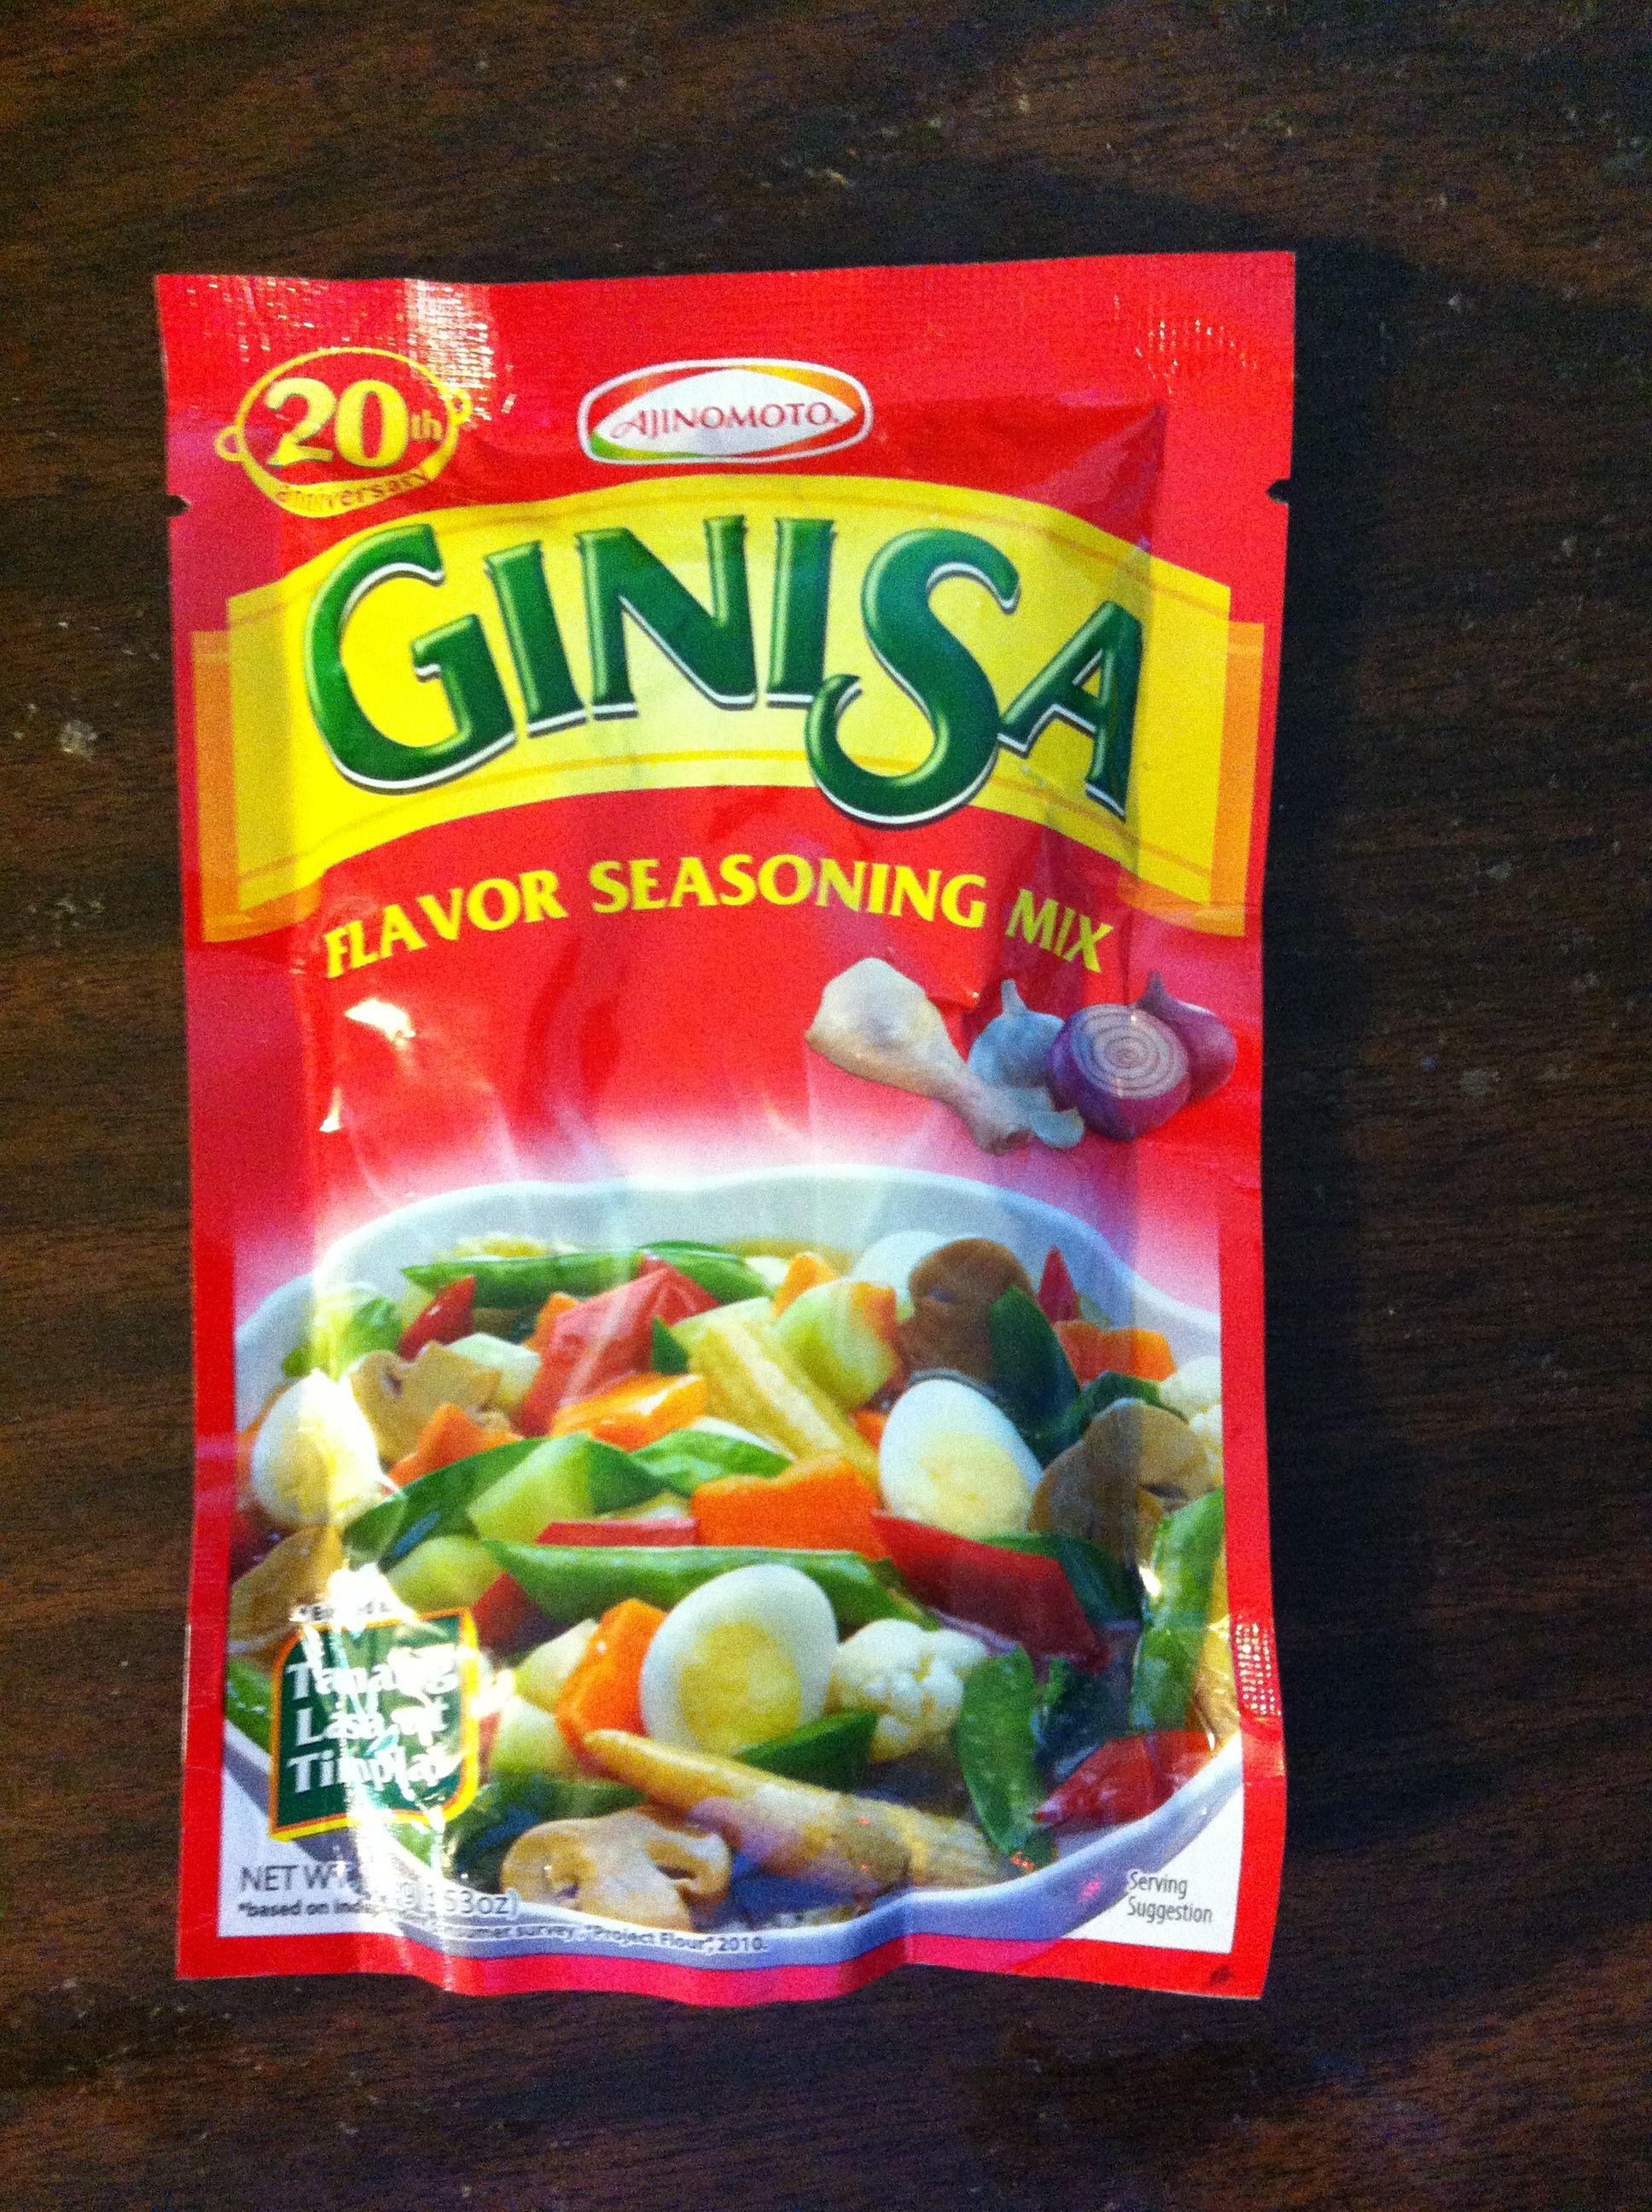 This's Ginisa Flavor Seasoning Mix Flavor seasoning